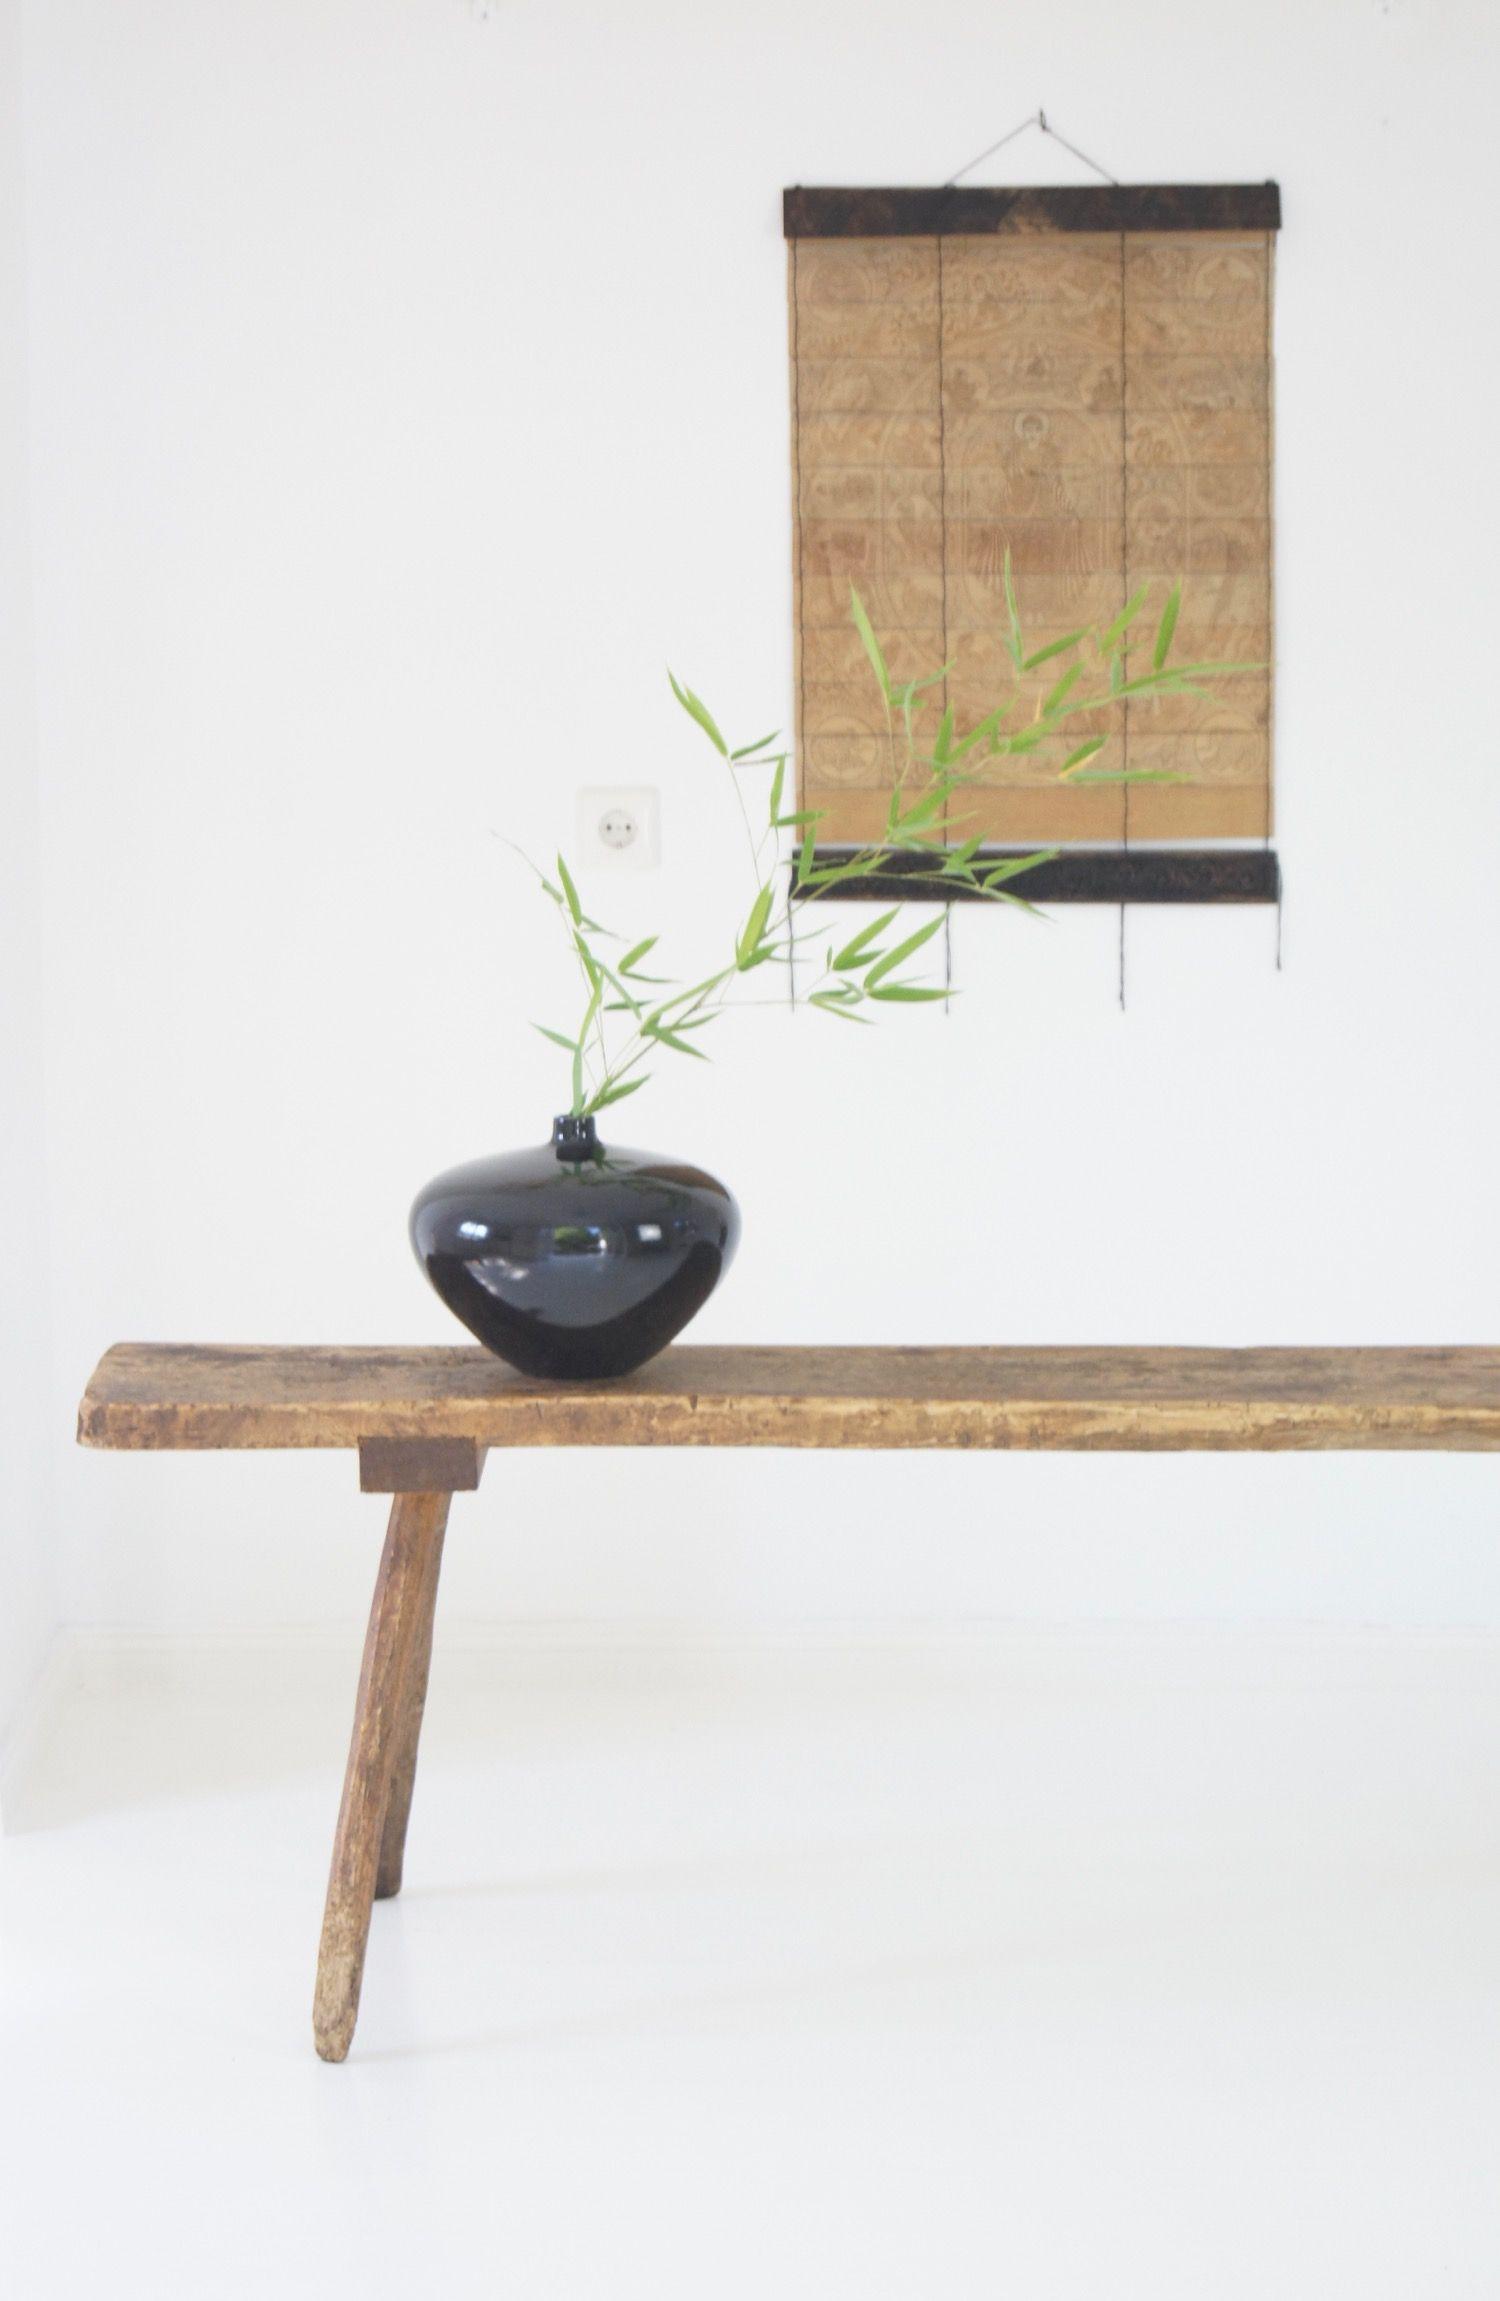 Holzbank antik, rustikal by boheme-living.com | Garten Bänke ...